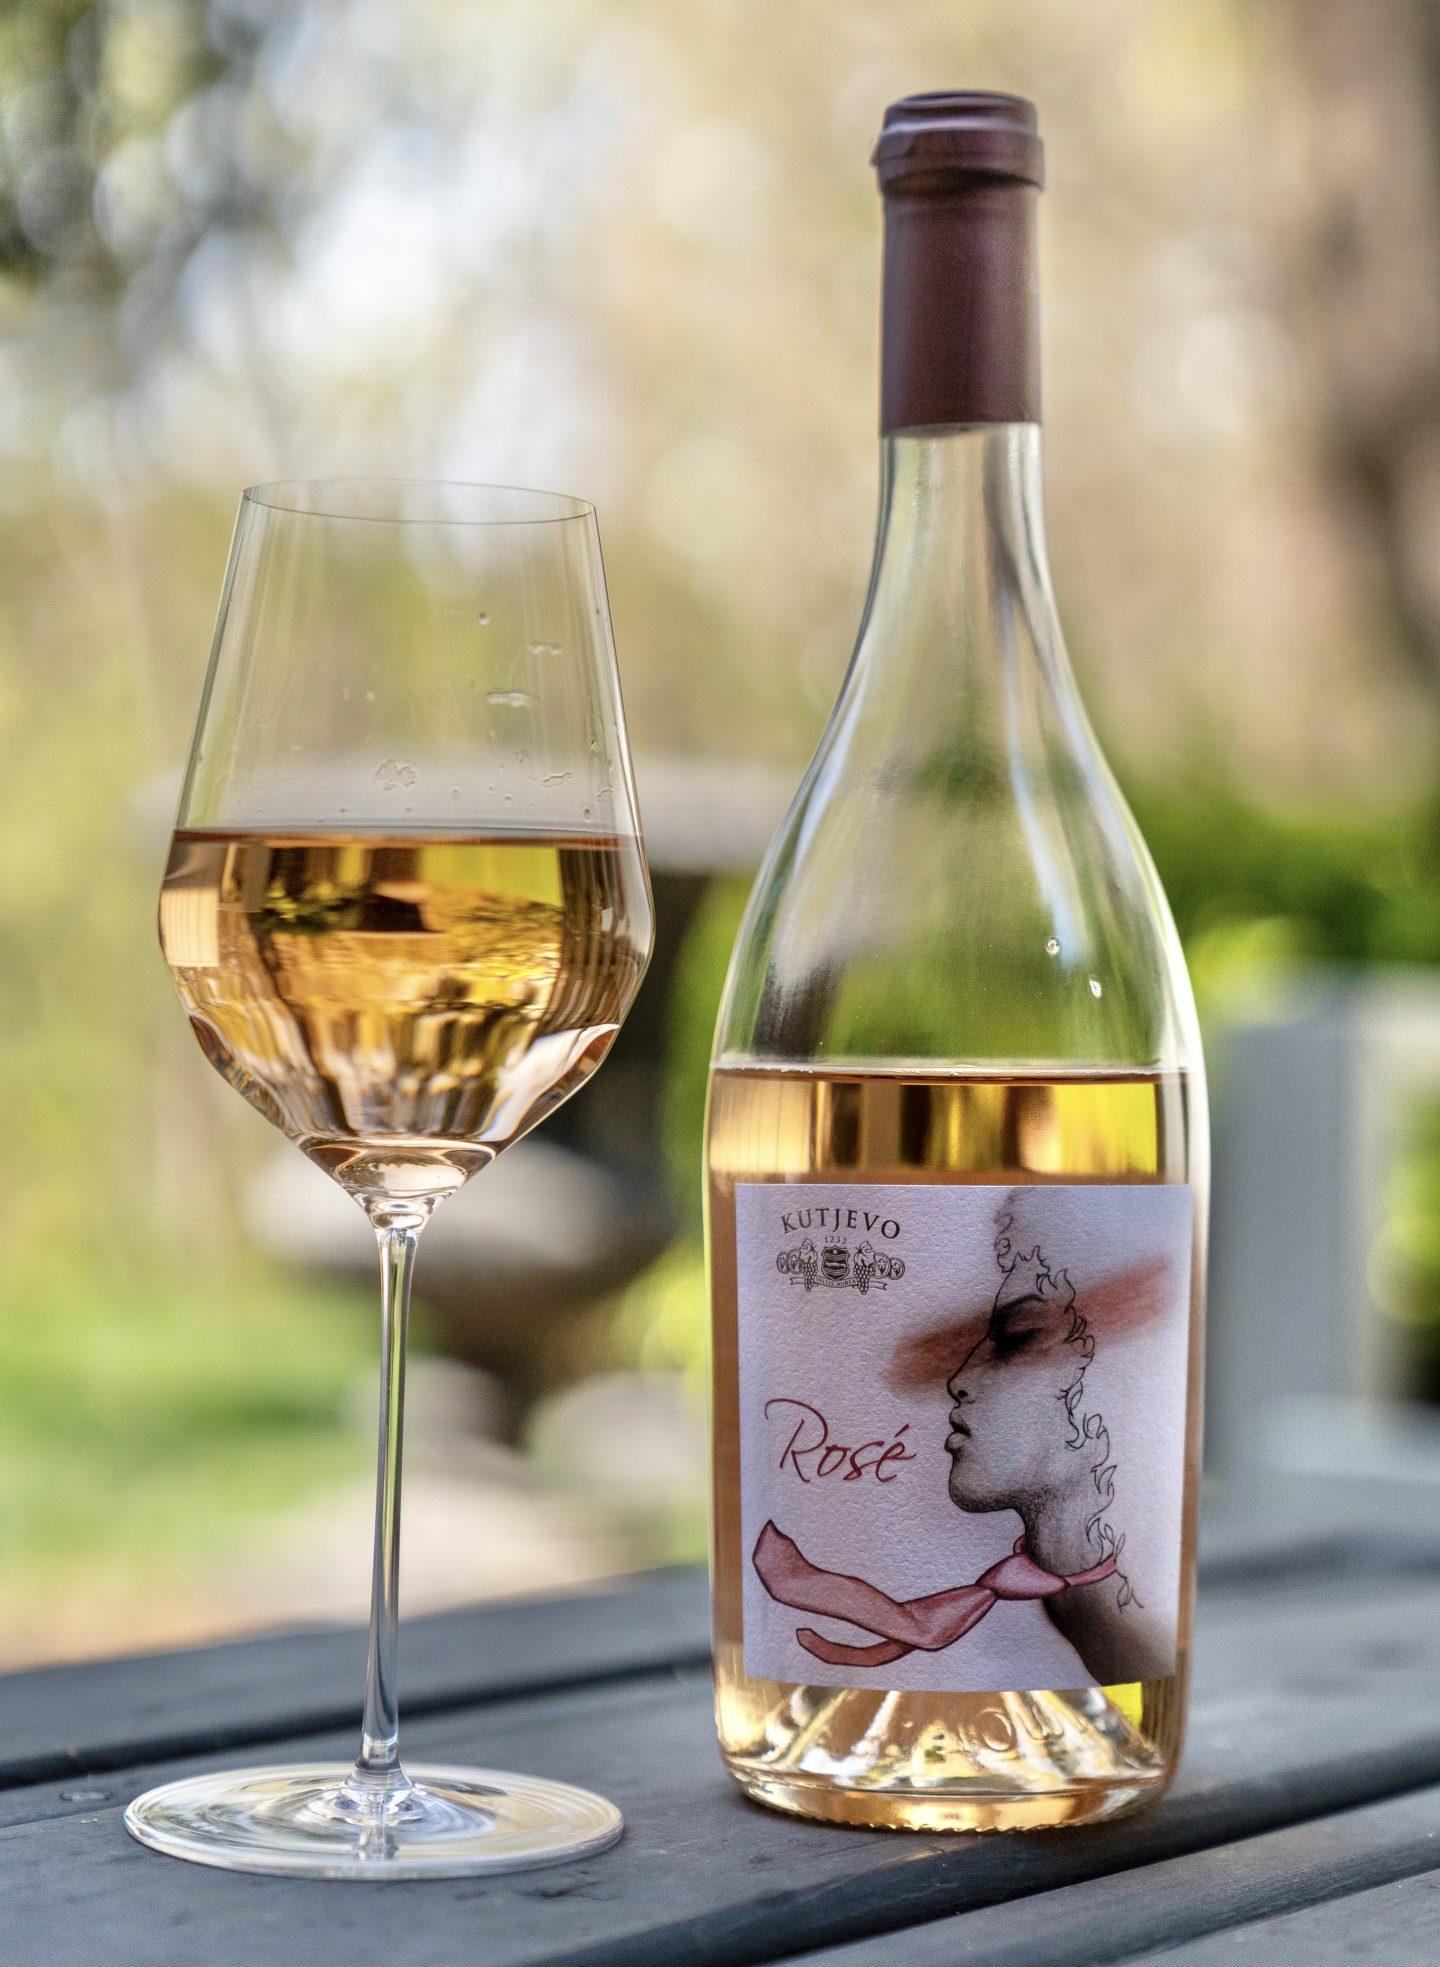 Croatian Rosé Wine Croatian Rosé Wine Croatian Rose Wine Croatian Rose Wine in Canada Croatian Rose wine in Toronto Croatian Rose wine in Ontario Kutjevo Rosé Wine 2019  Kutjevo Winery Croatian wine ontario